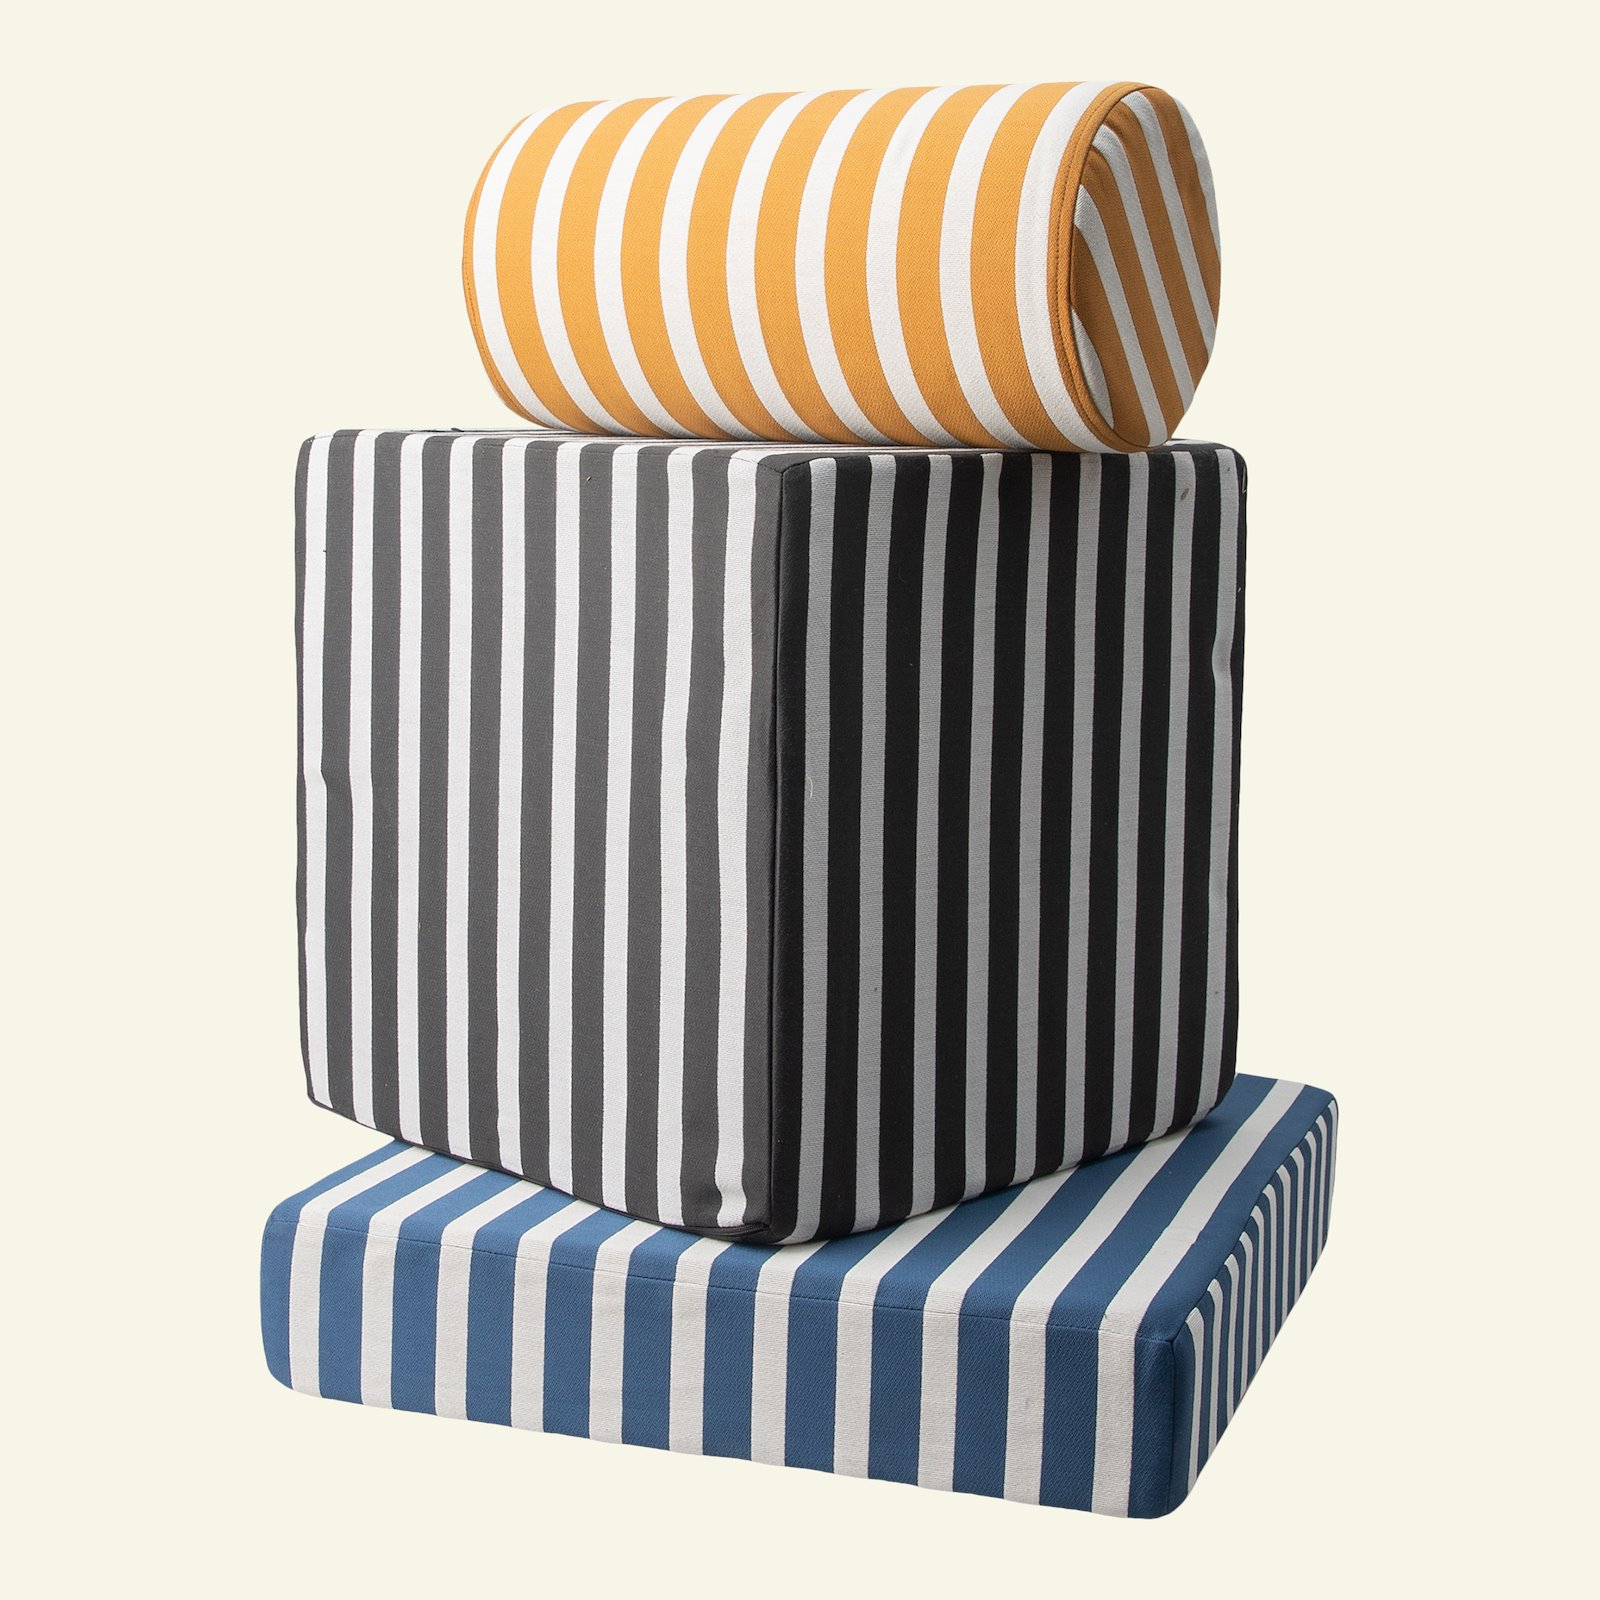 Jacquard yarn dyed petrol/sand stripe 824064_p1000000674_824065_824066_sskit